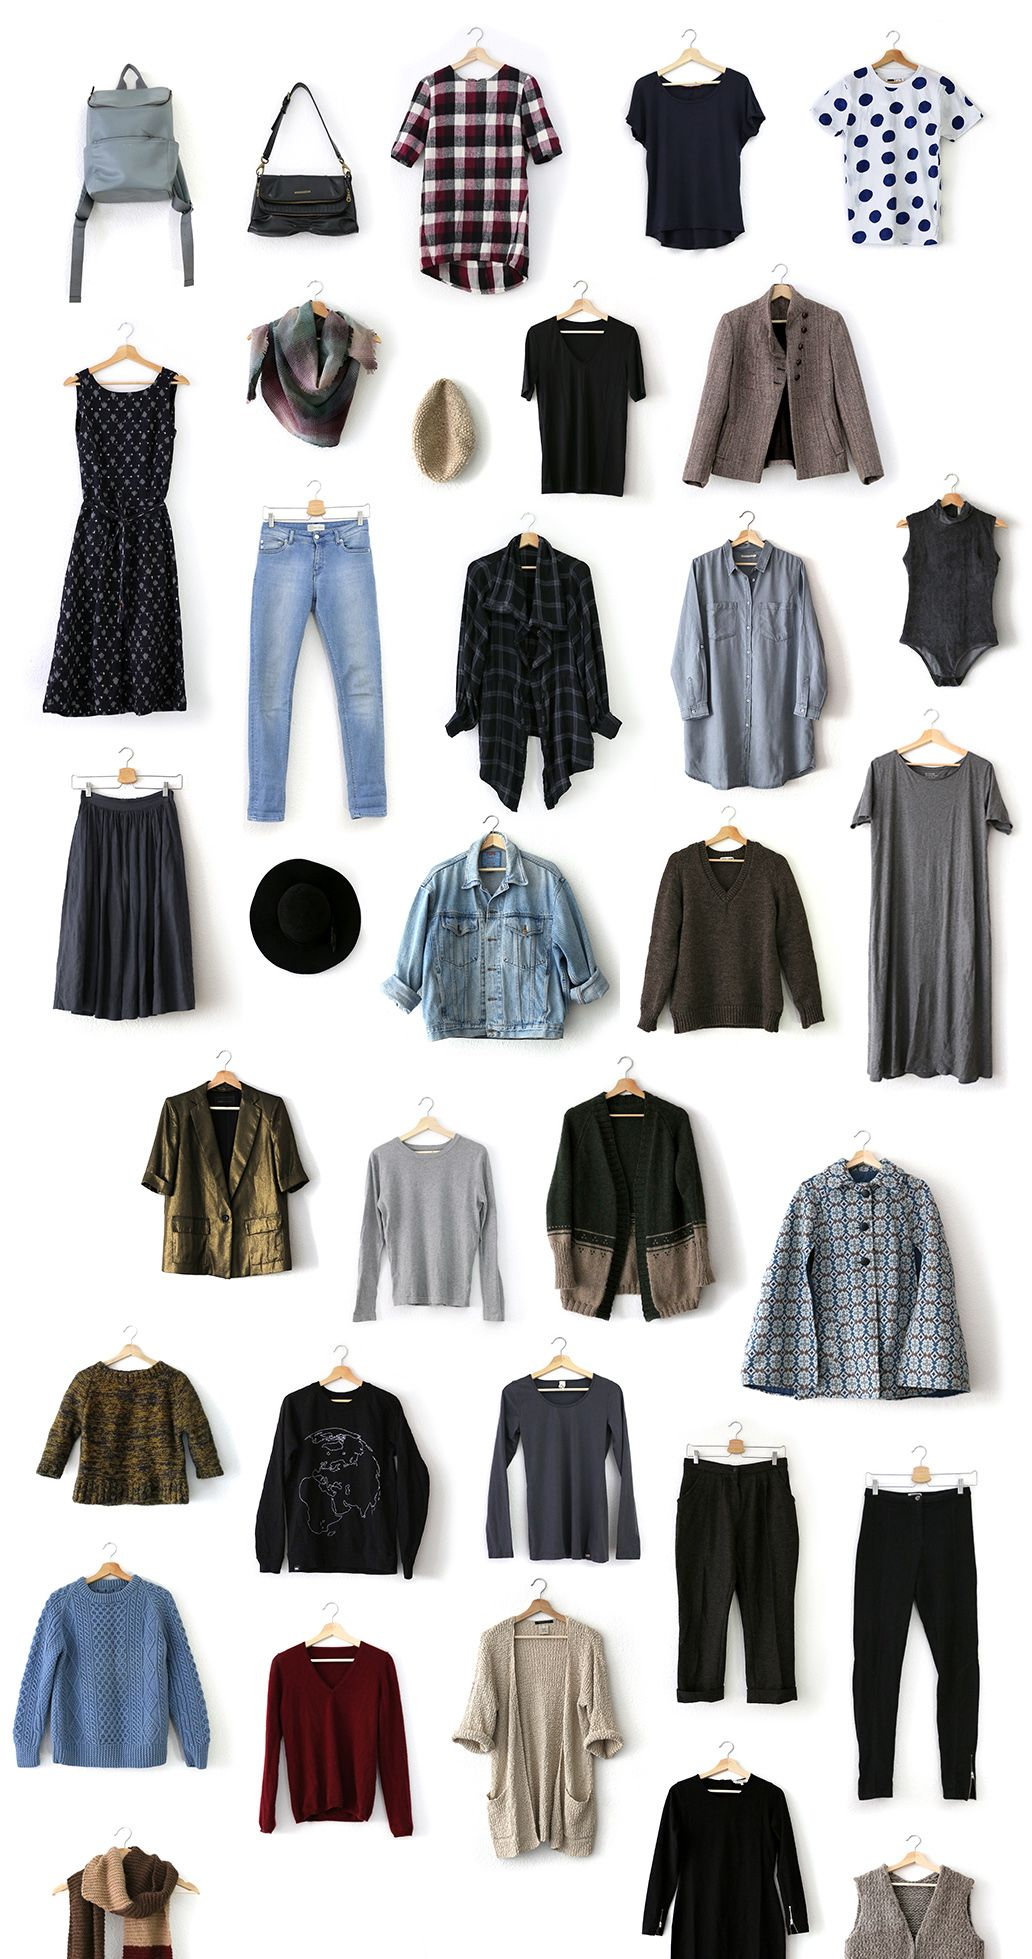 Winter Project 333 Capsule Wardrobe